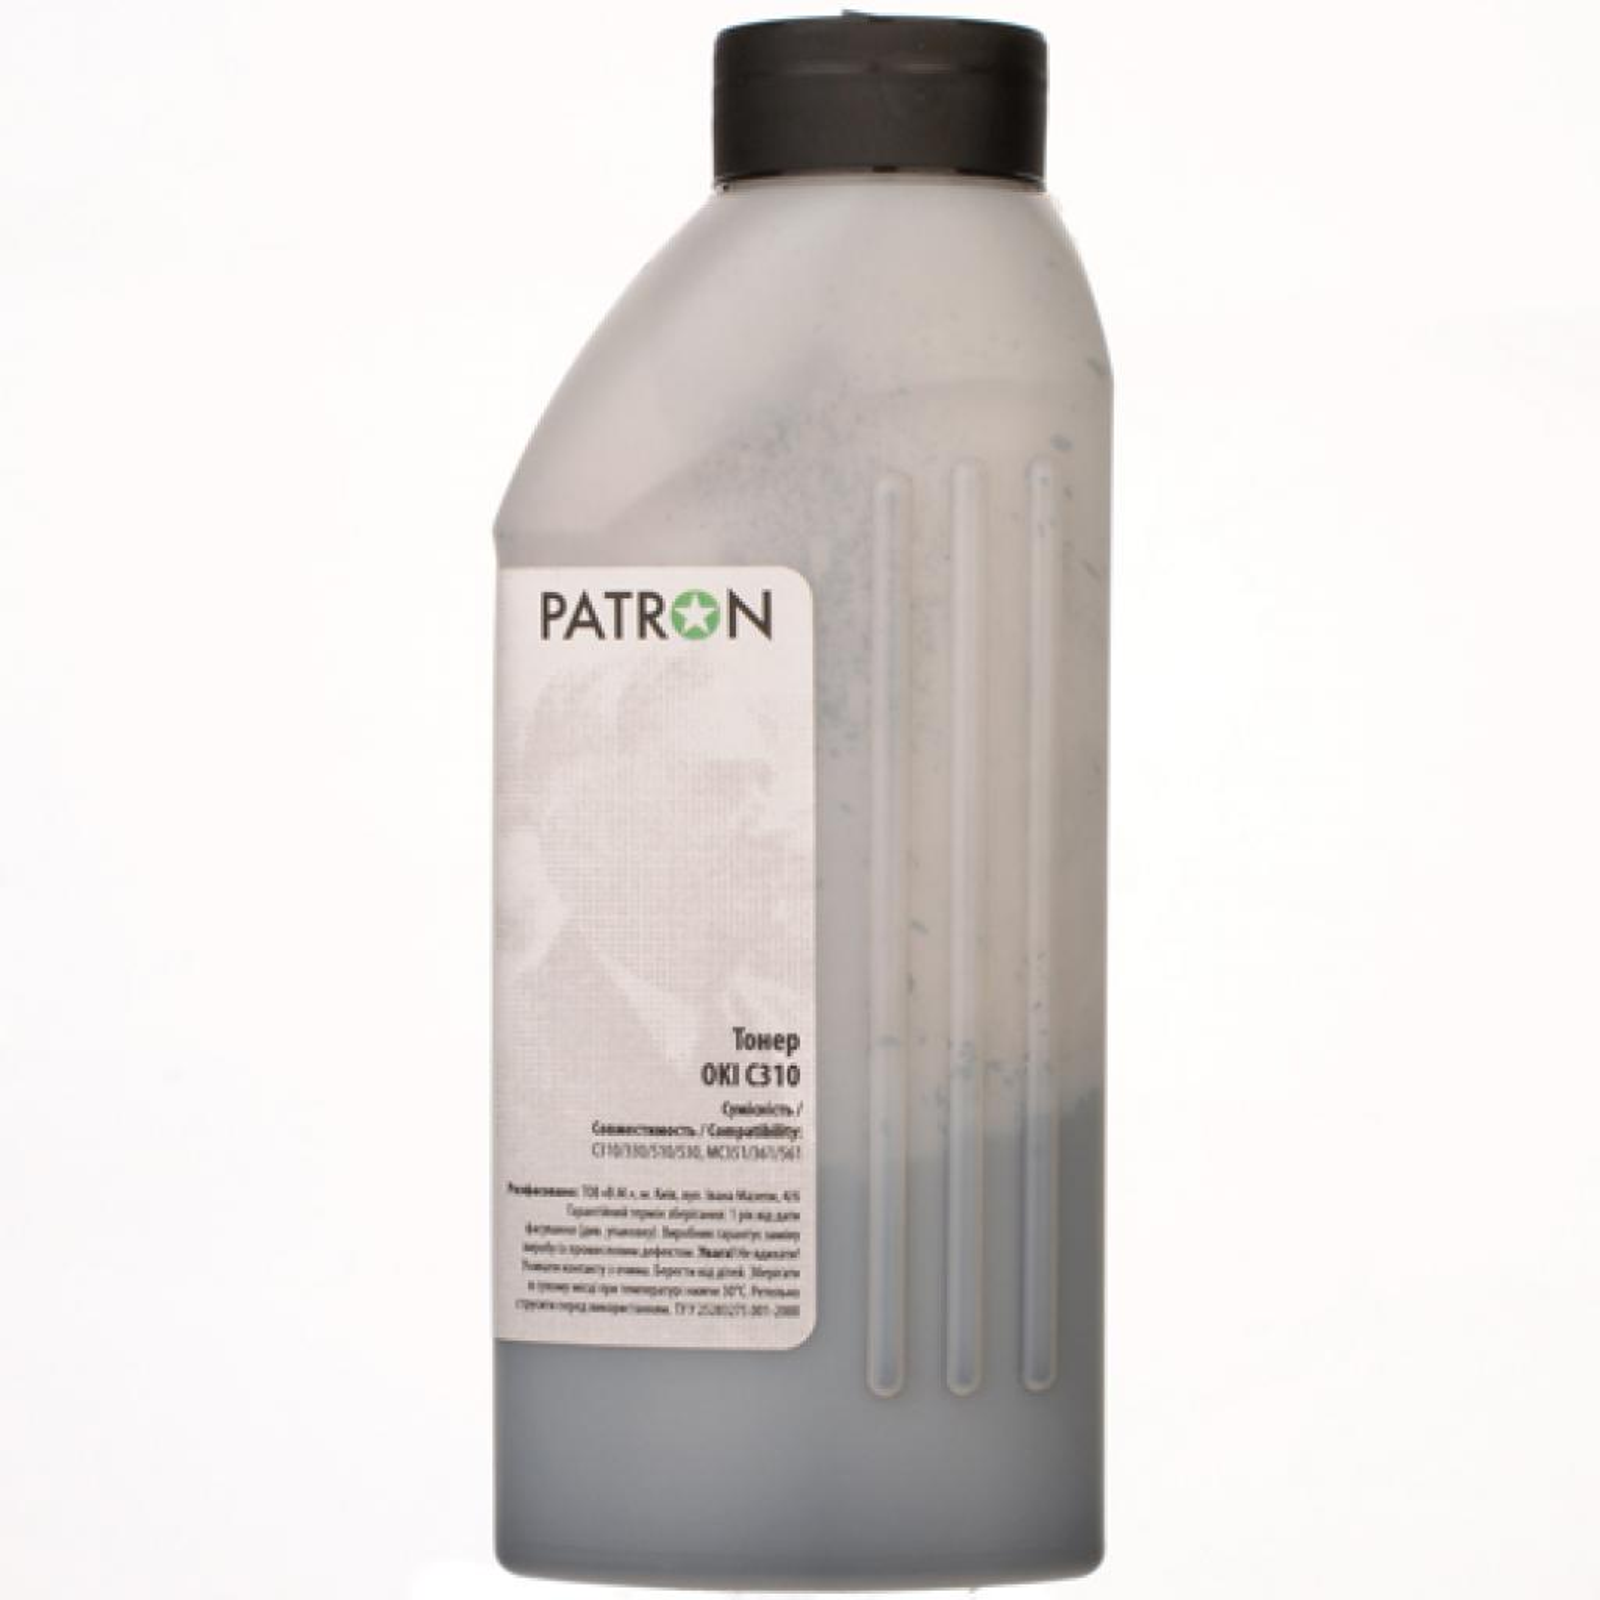 Тонер PATRON OKI C310 BLACK 80г (T-PN-OC310-B-080) изображение 2